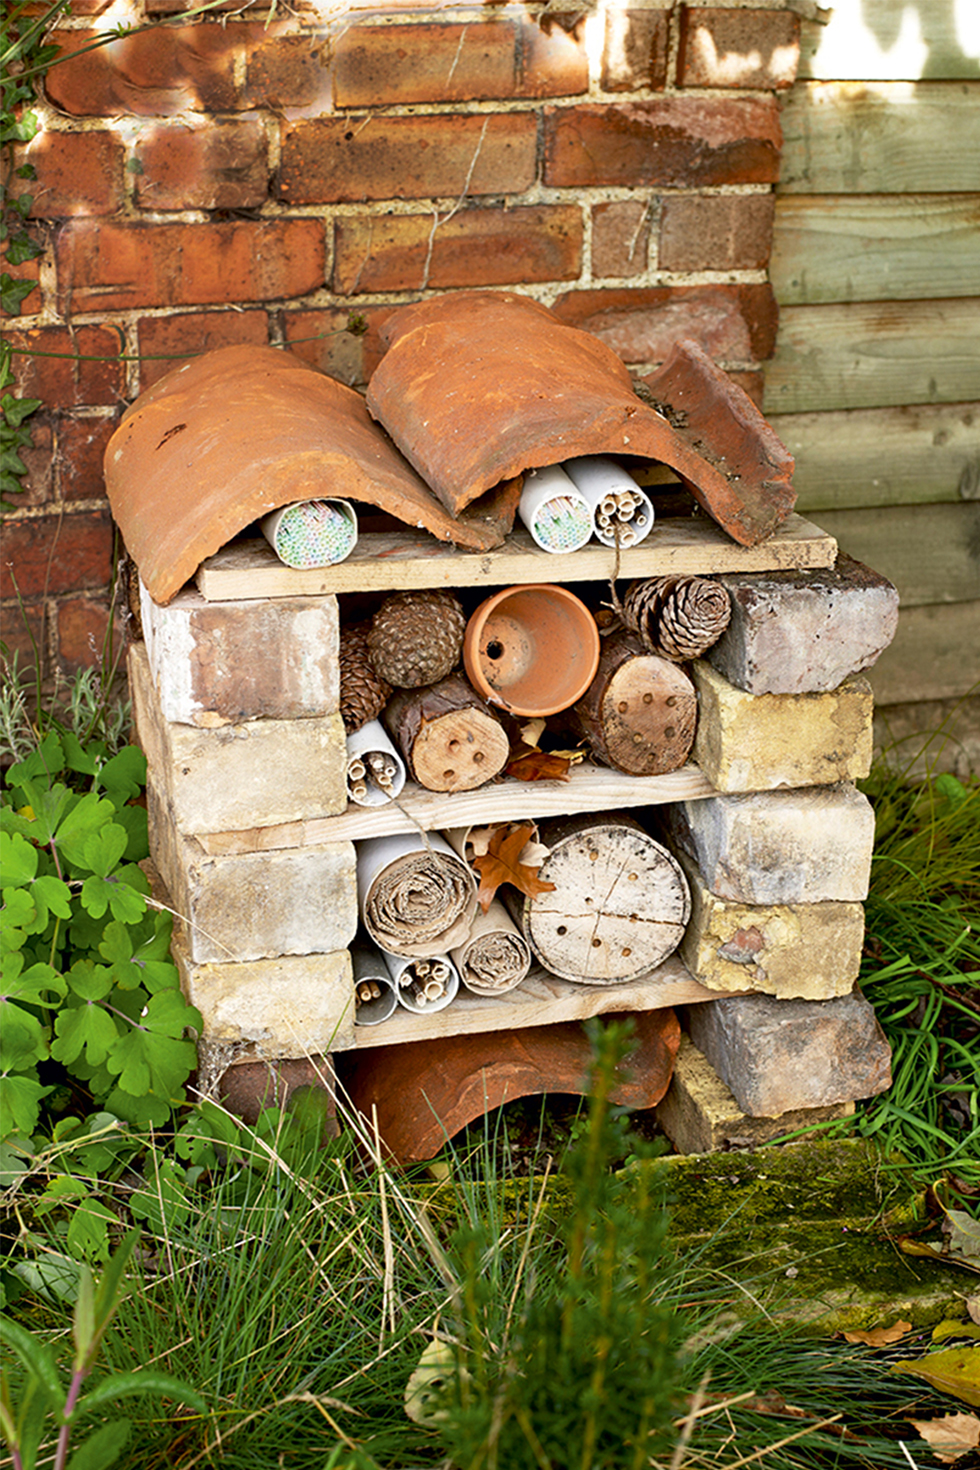 Homemade bug hotel garden craft